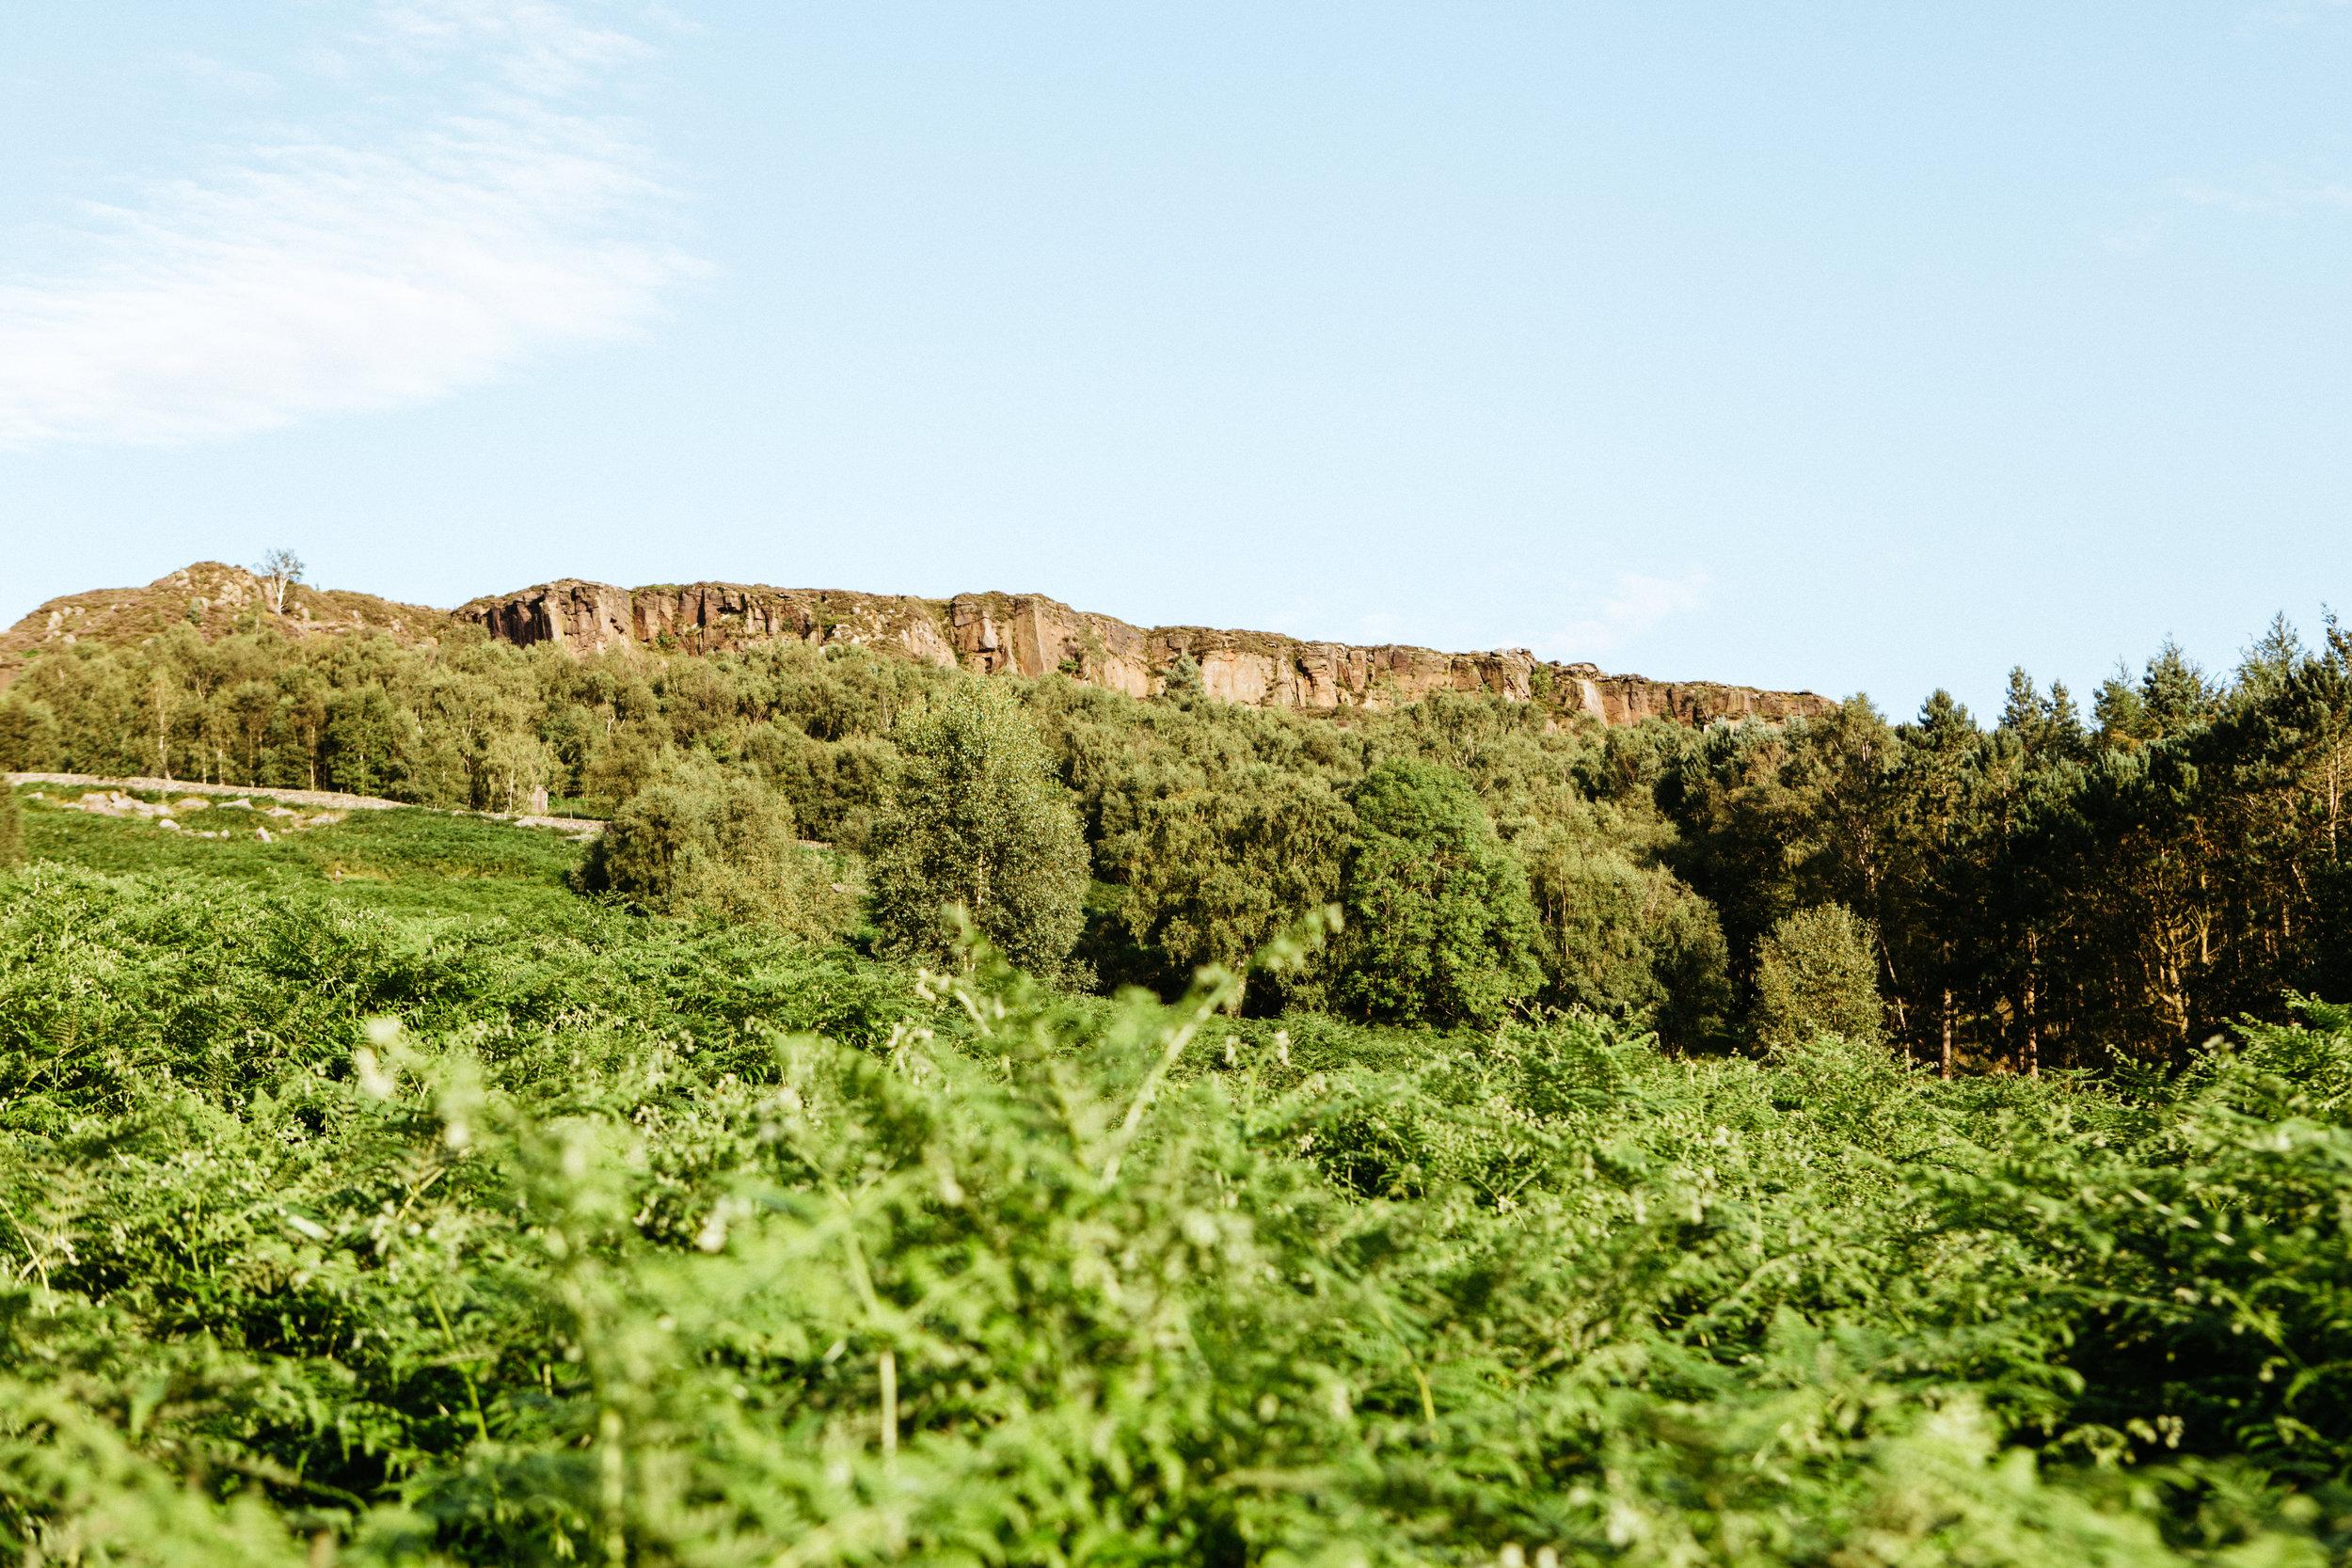 Views of Millstone Edge from Little Moor